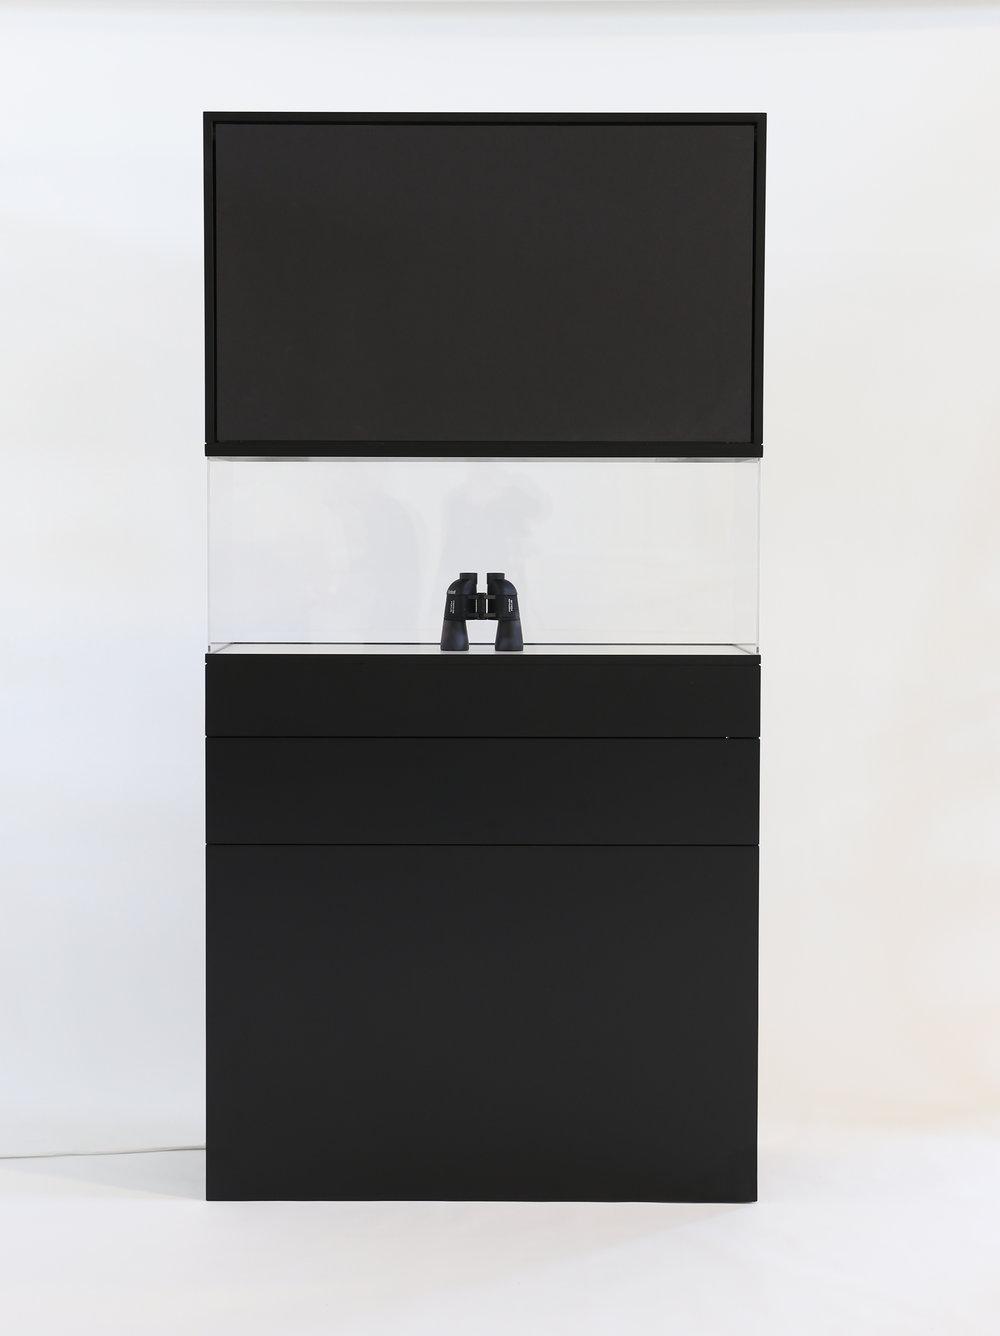 STRYKER_151203- Display Case3.jpg